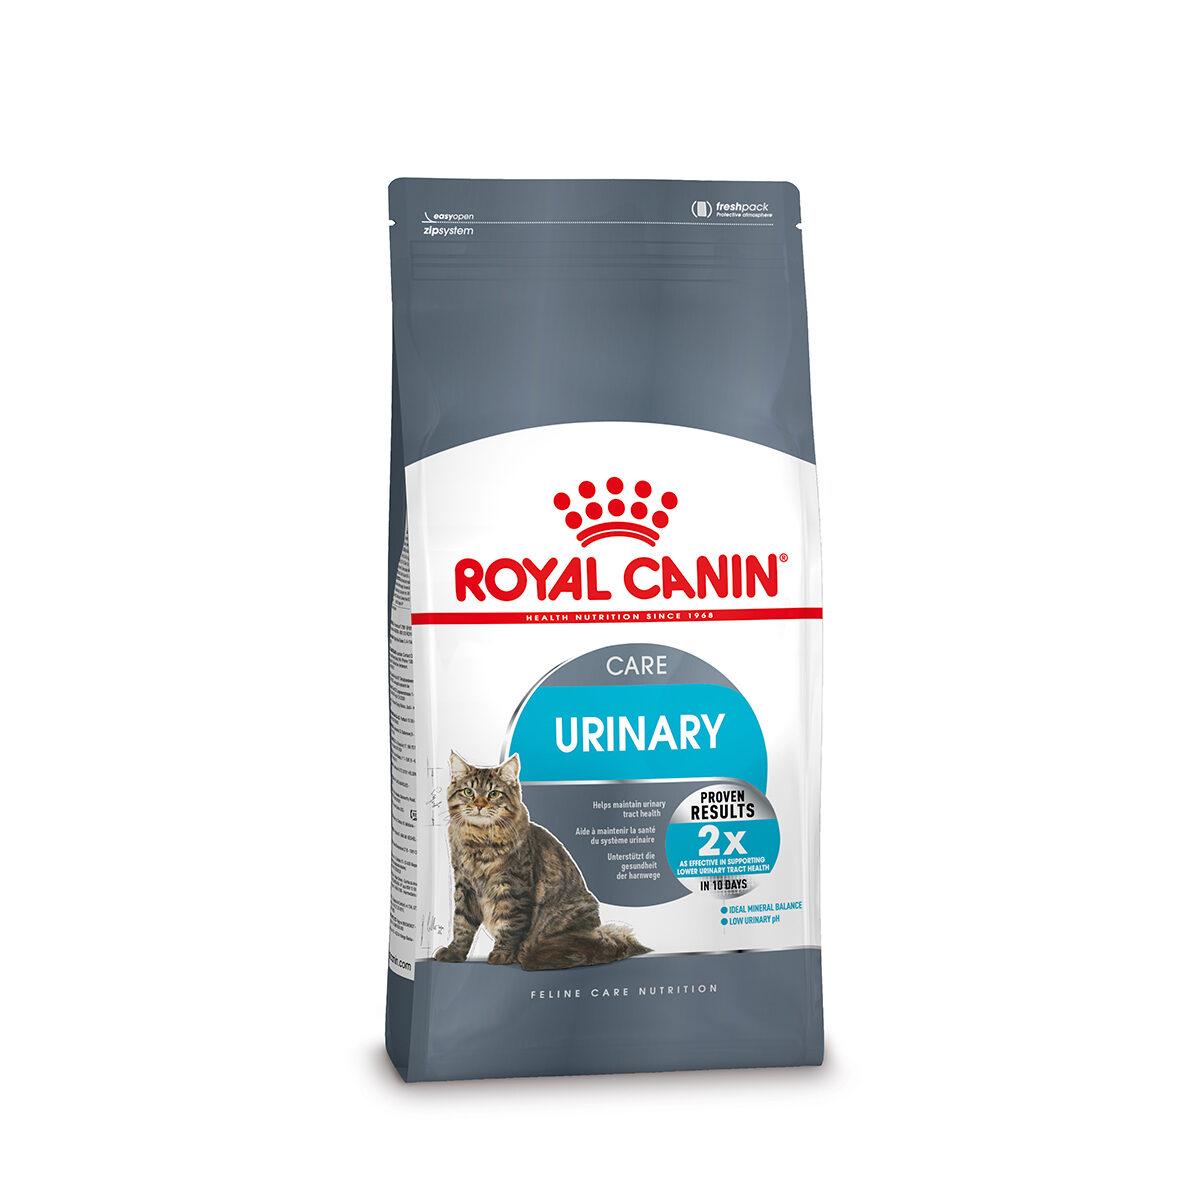 Royal Canin Urinary Care Kattenvoer 4 kg